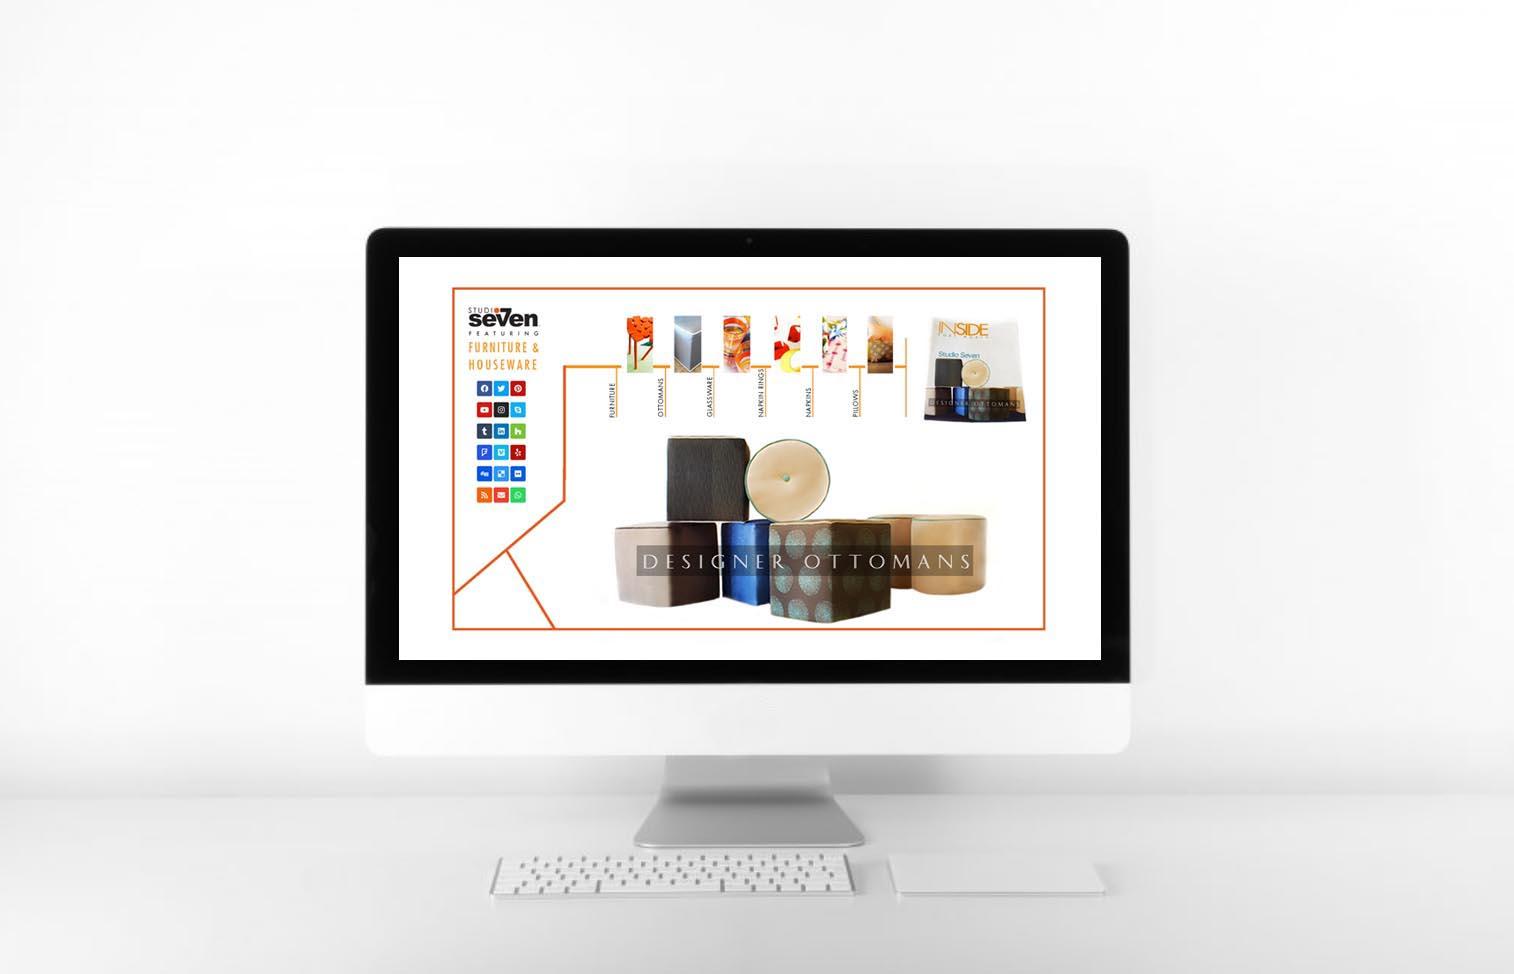 desktop-S20-website-design-company